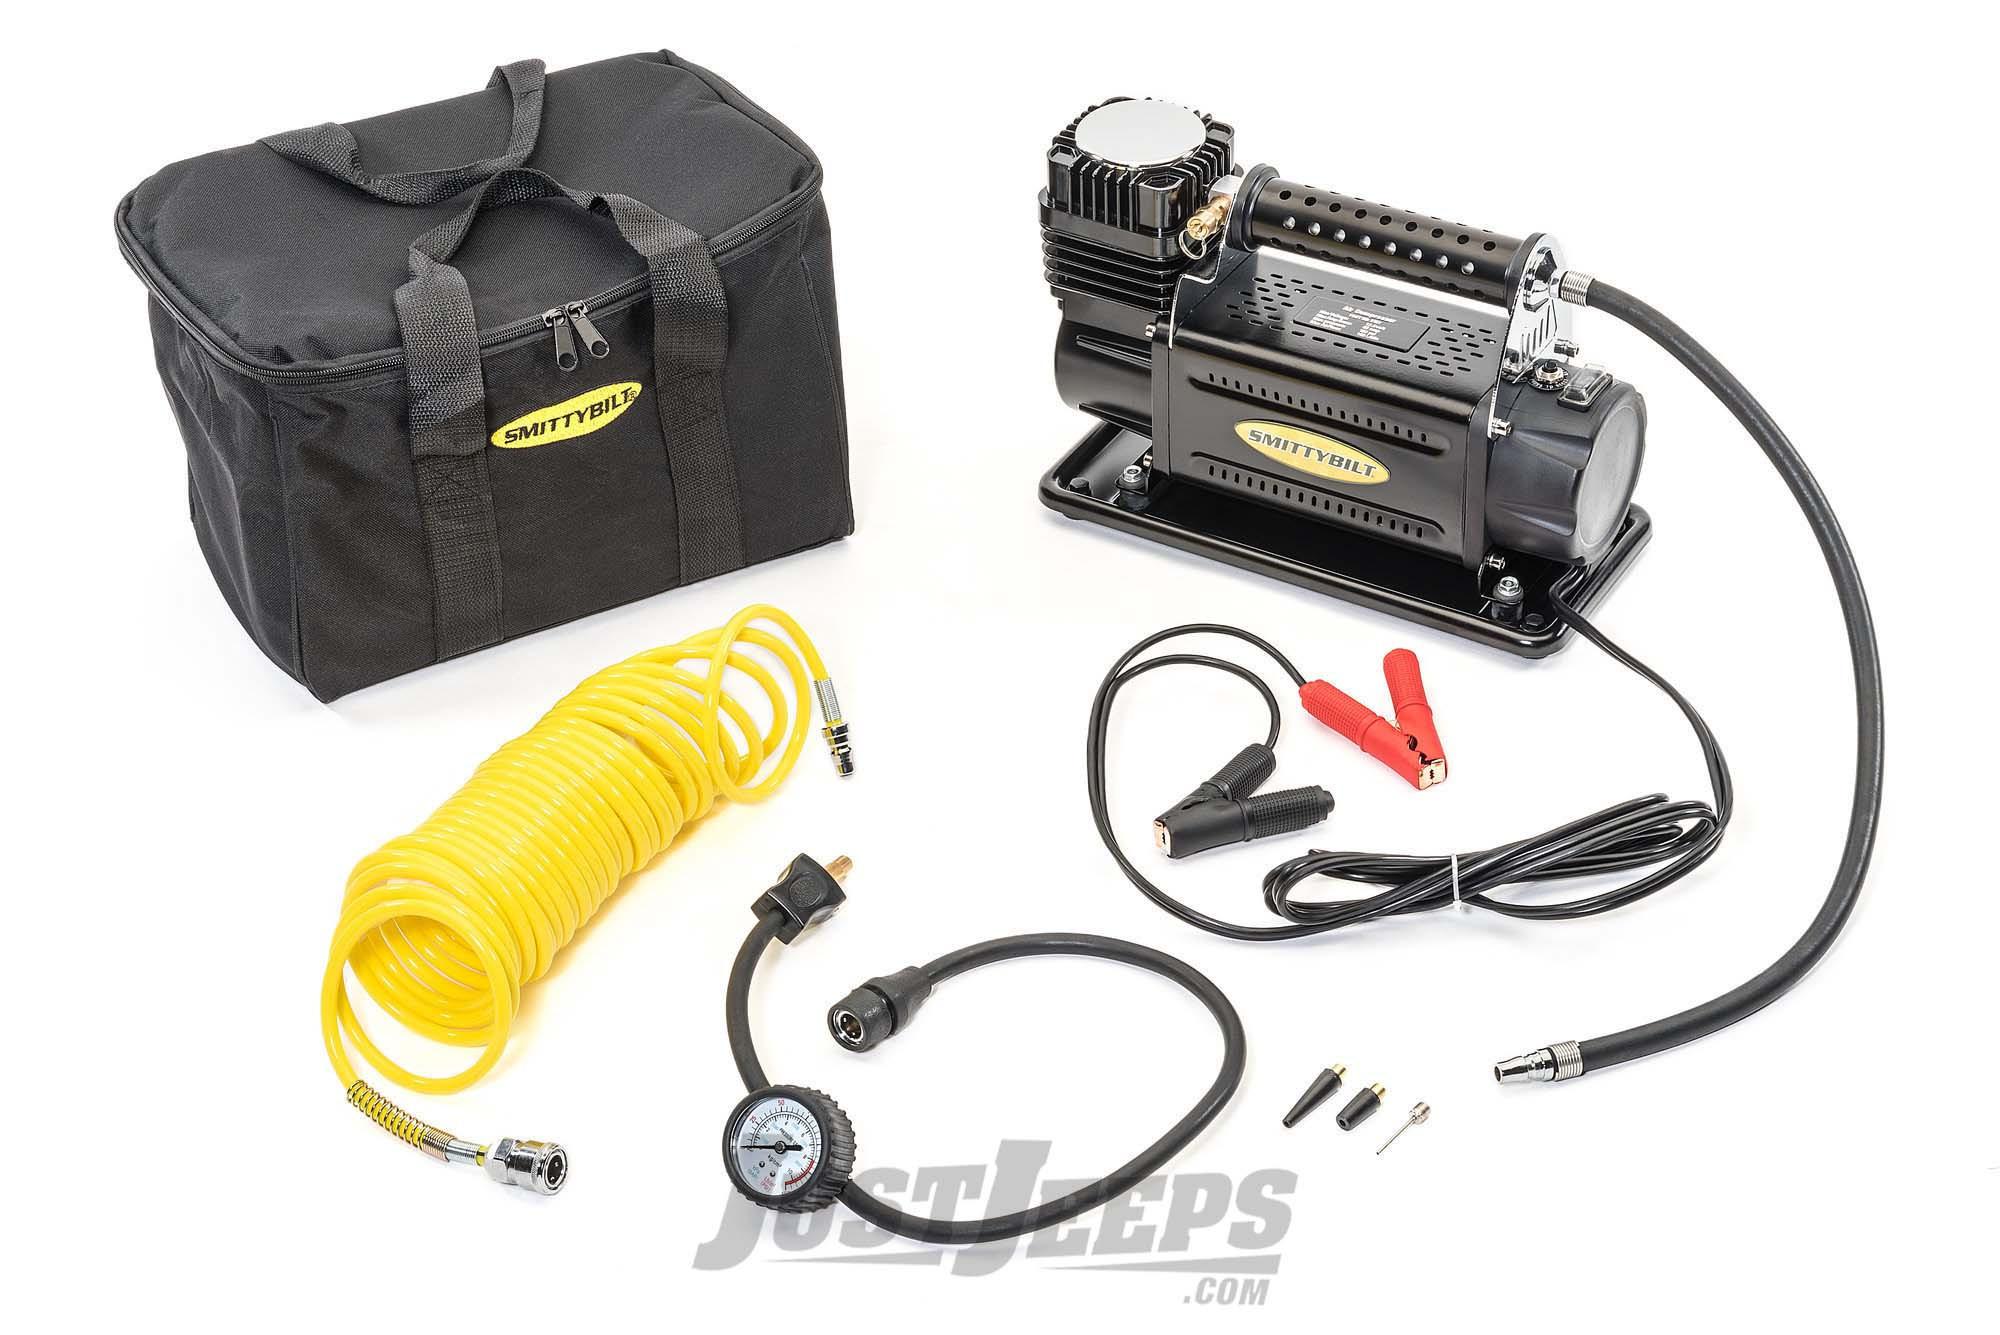 SmittyBilt Heavy Duty Air Compressor Portable & Produces 5.65 CFM/ 160 LPM